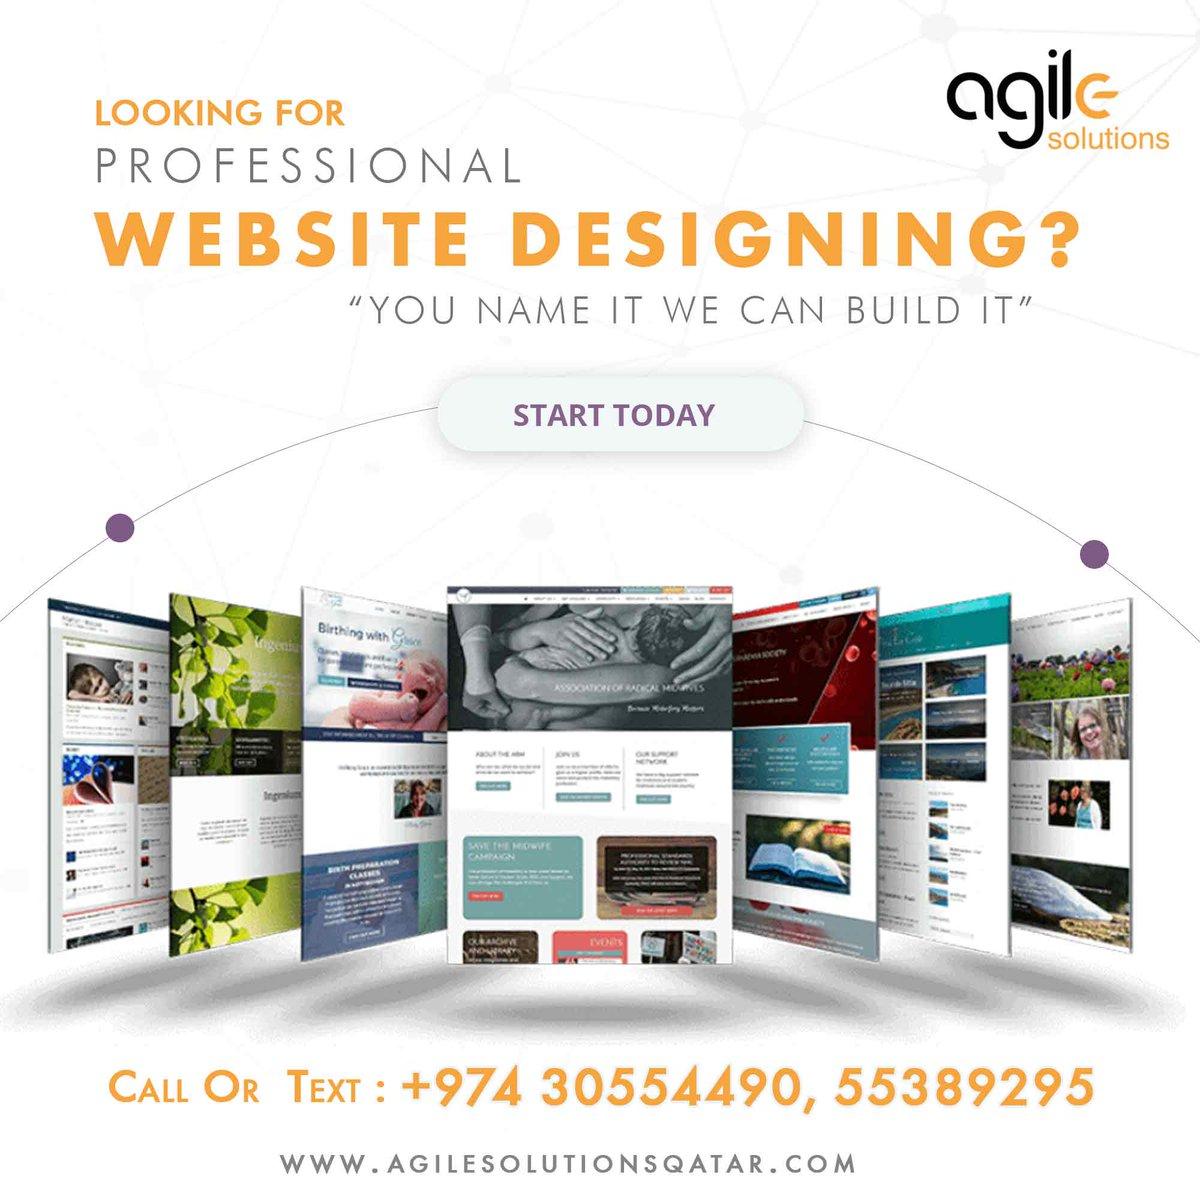 "Looking for #Professional_Website_Designing? ""You Name It We Can Build It"" Call:+974 55389295  https:// wa.me/+97430554490      https://www. agilesolutionsqatar.com     #ecommercewebsite #websitedesiging #agilesolutions #itcompanyqatar #webdesign #website #webdevelopment #qatar #doha #seo #digitalmarketing<br>http://pic.twitter.com/gSTMlvSLDi"